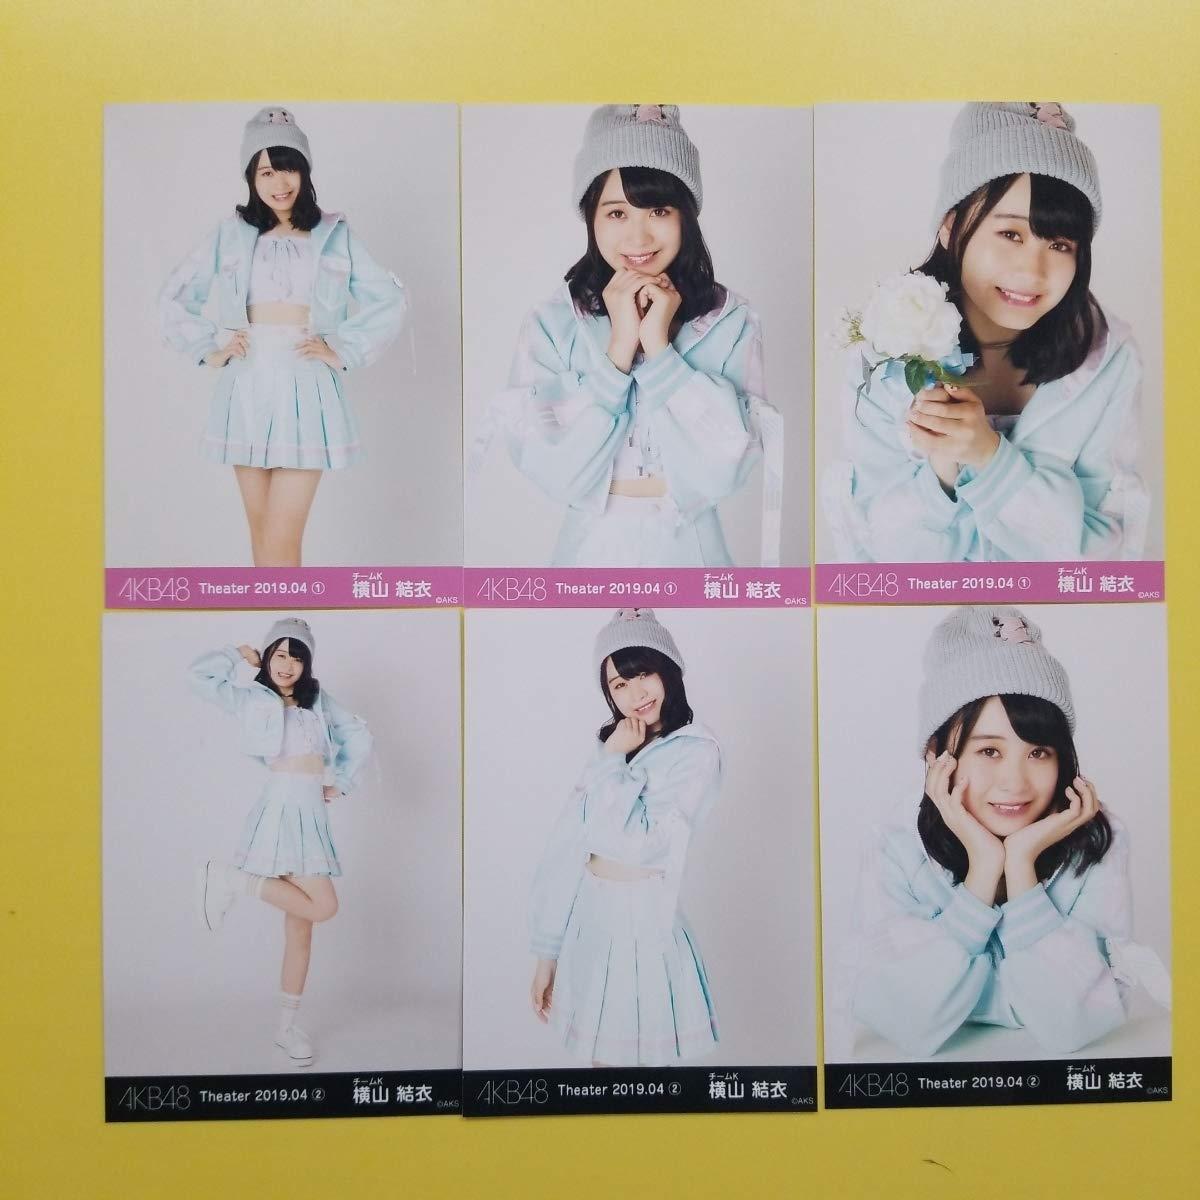 AKB48 チーム8 横山結衣 月別生写真 2019 4月 April ①+② 6種コンプ   B07QGNWQCC